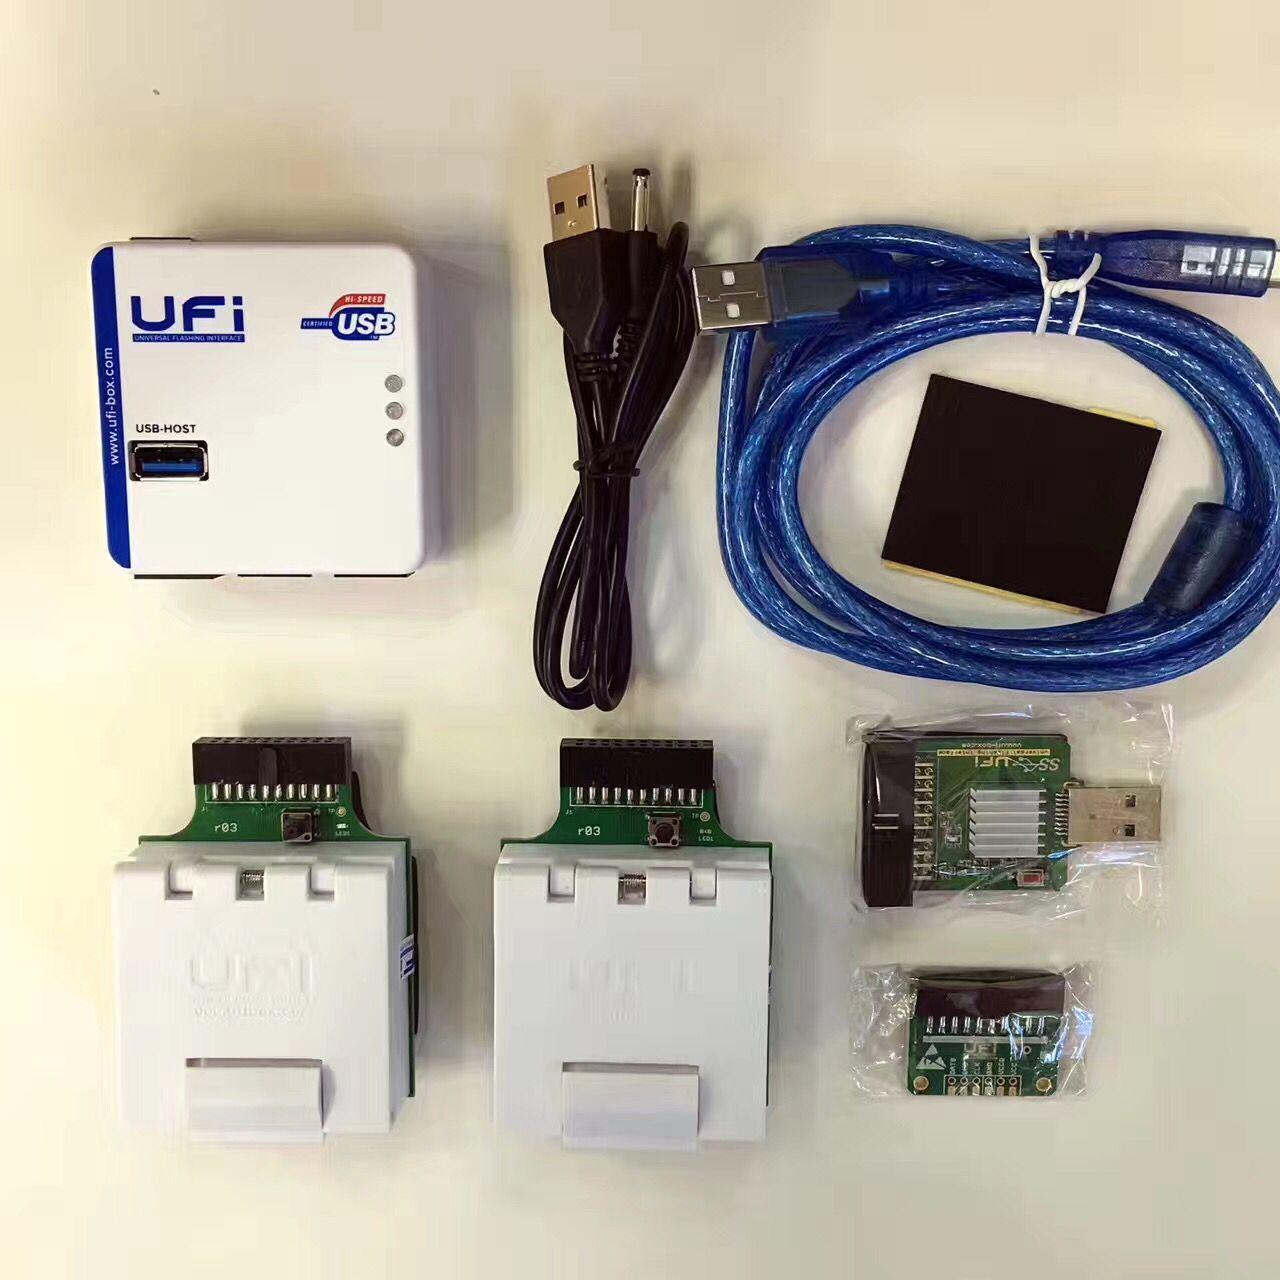 Telecom Parts 2019 New Original E-mate X Emmc Bga 13 In1 Support Bga100 136 168 153 169 162 186 221 529 254 For Easy Jtag Plus Ufi Box Riff For Fast Shipping